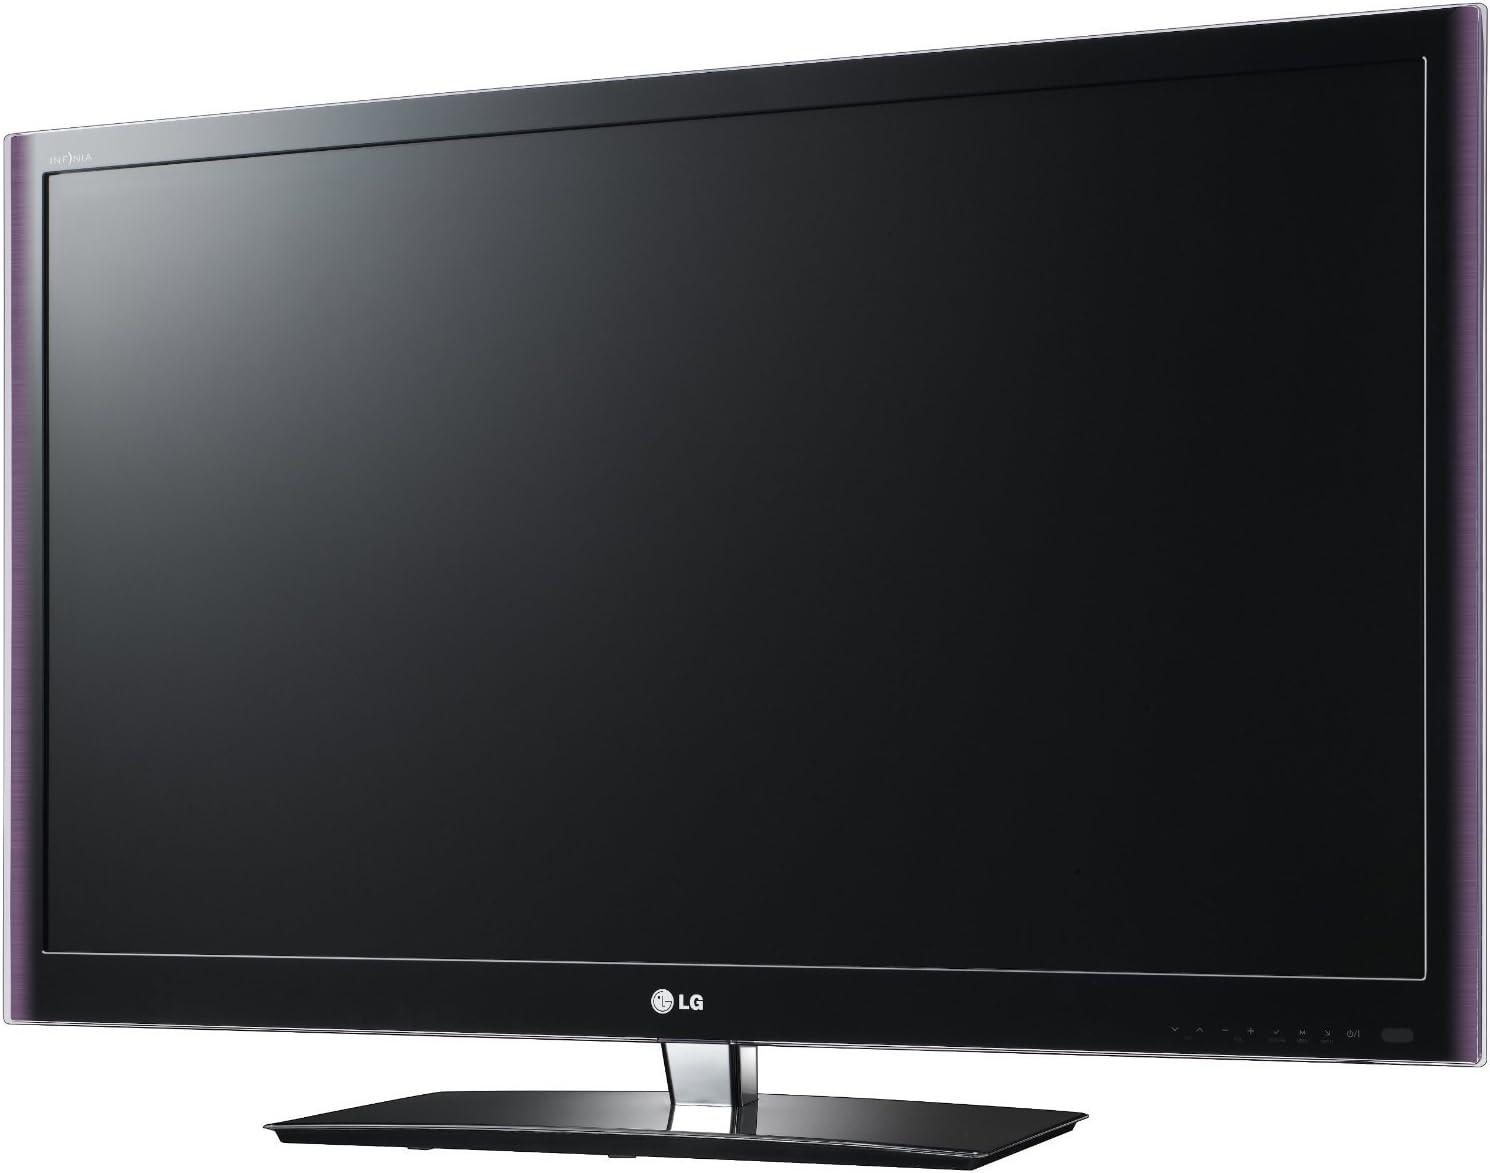 LG 42LW5500 - Televisor 3D, 42